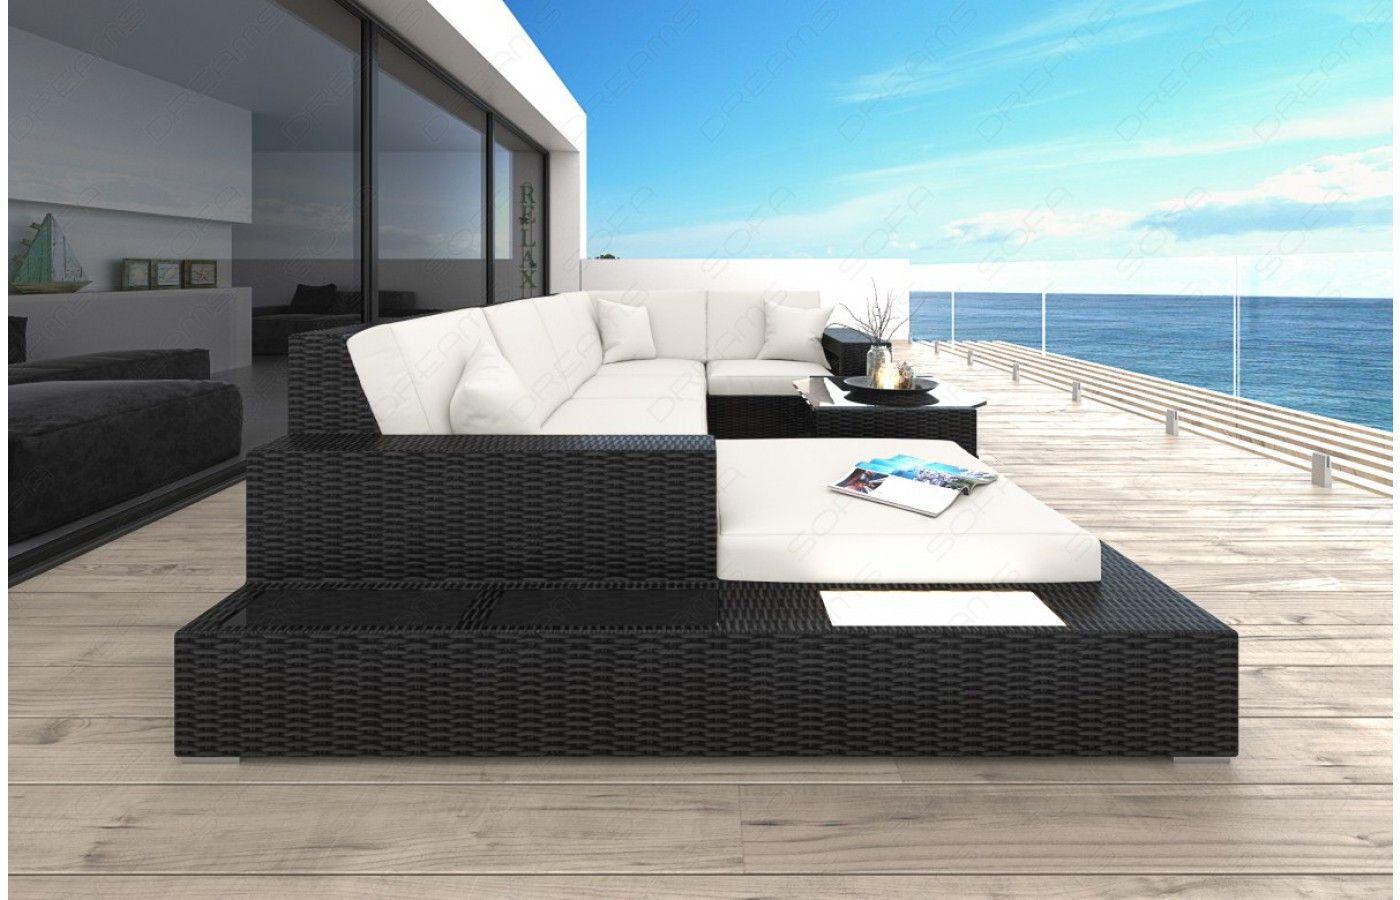 Good  Rattan Sofa Lounge MESSANA f r den Au enbereich mit LED Beleuchtung